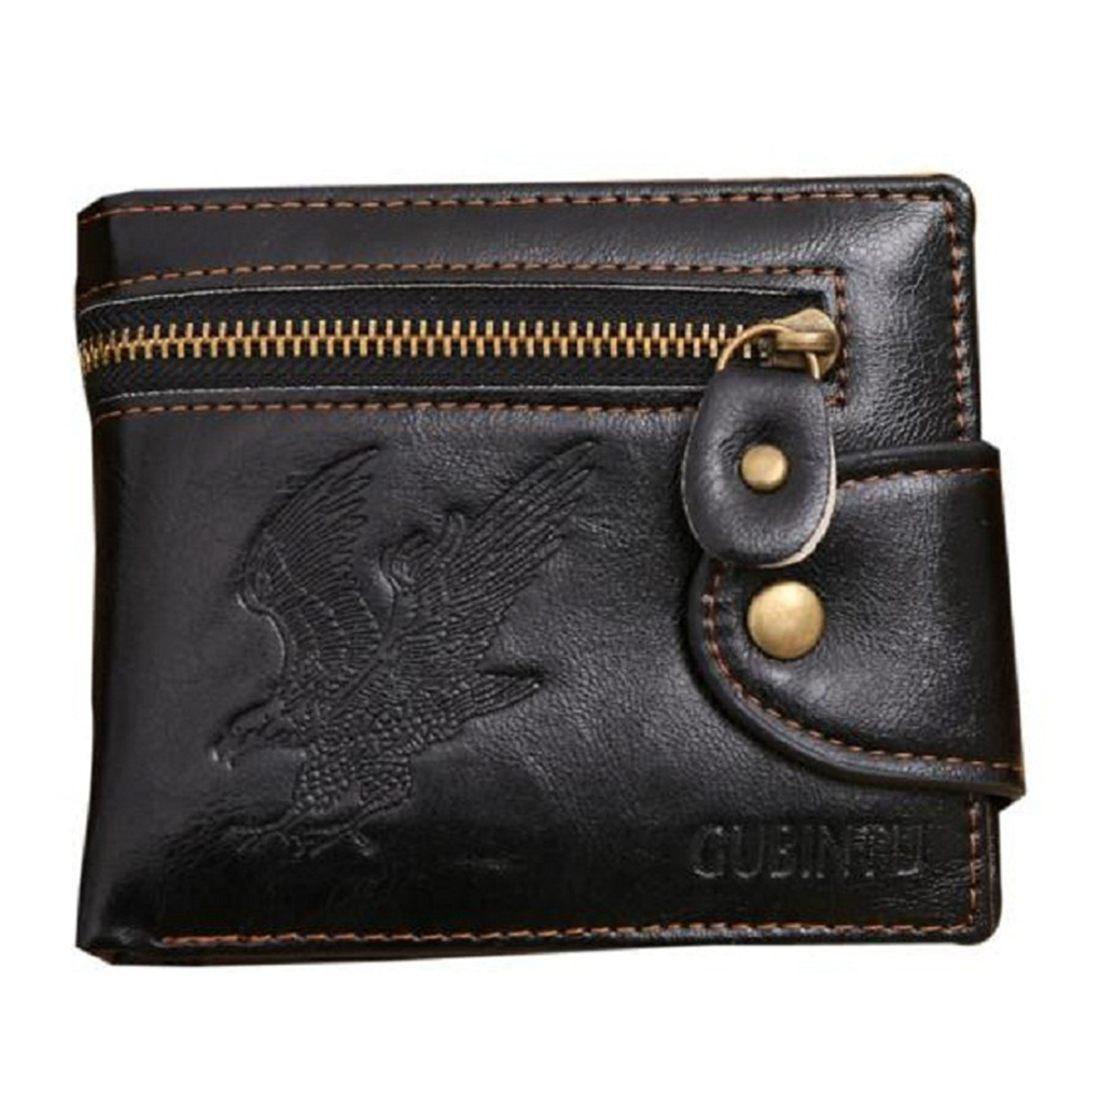 Gubintu Men's New Fashion High Quality Mini Zipper Purse Male Pu Leather Card Cash Receipt Bags Holder Boys Clutch Purse Dec7 star wars purse high quality leather